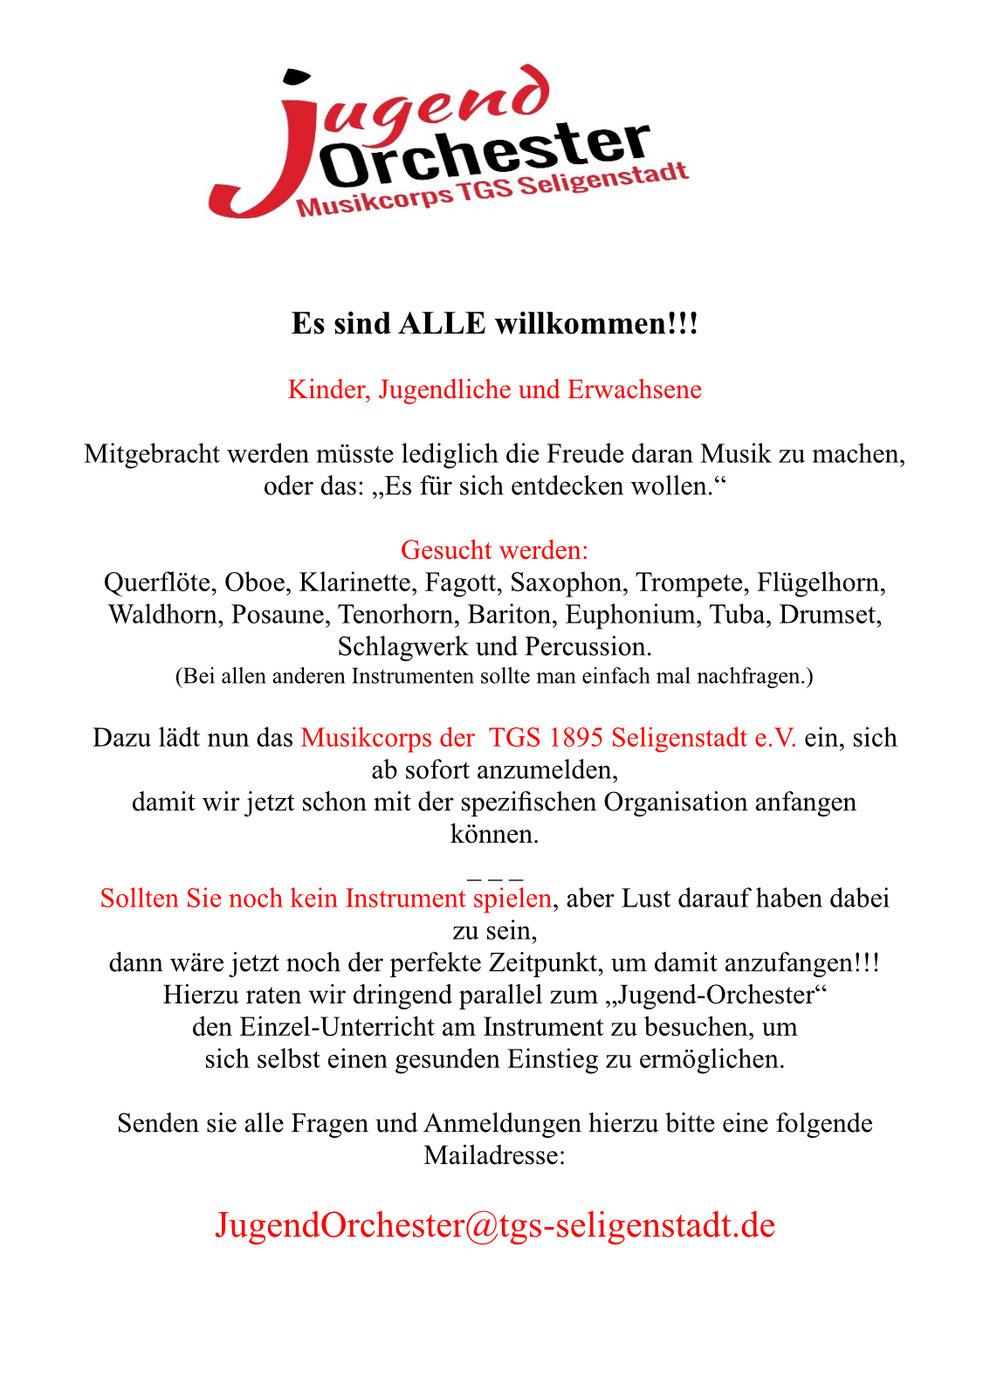 Jugendorchester Musikcorps TGS Seligenstadt